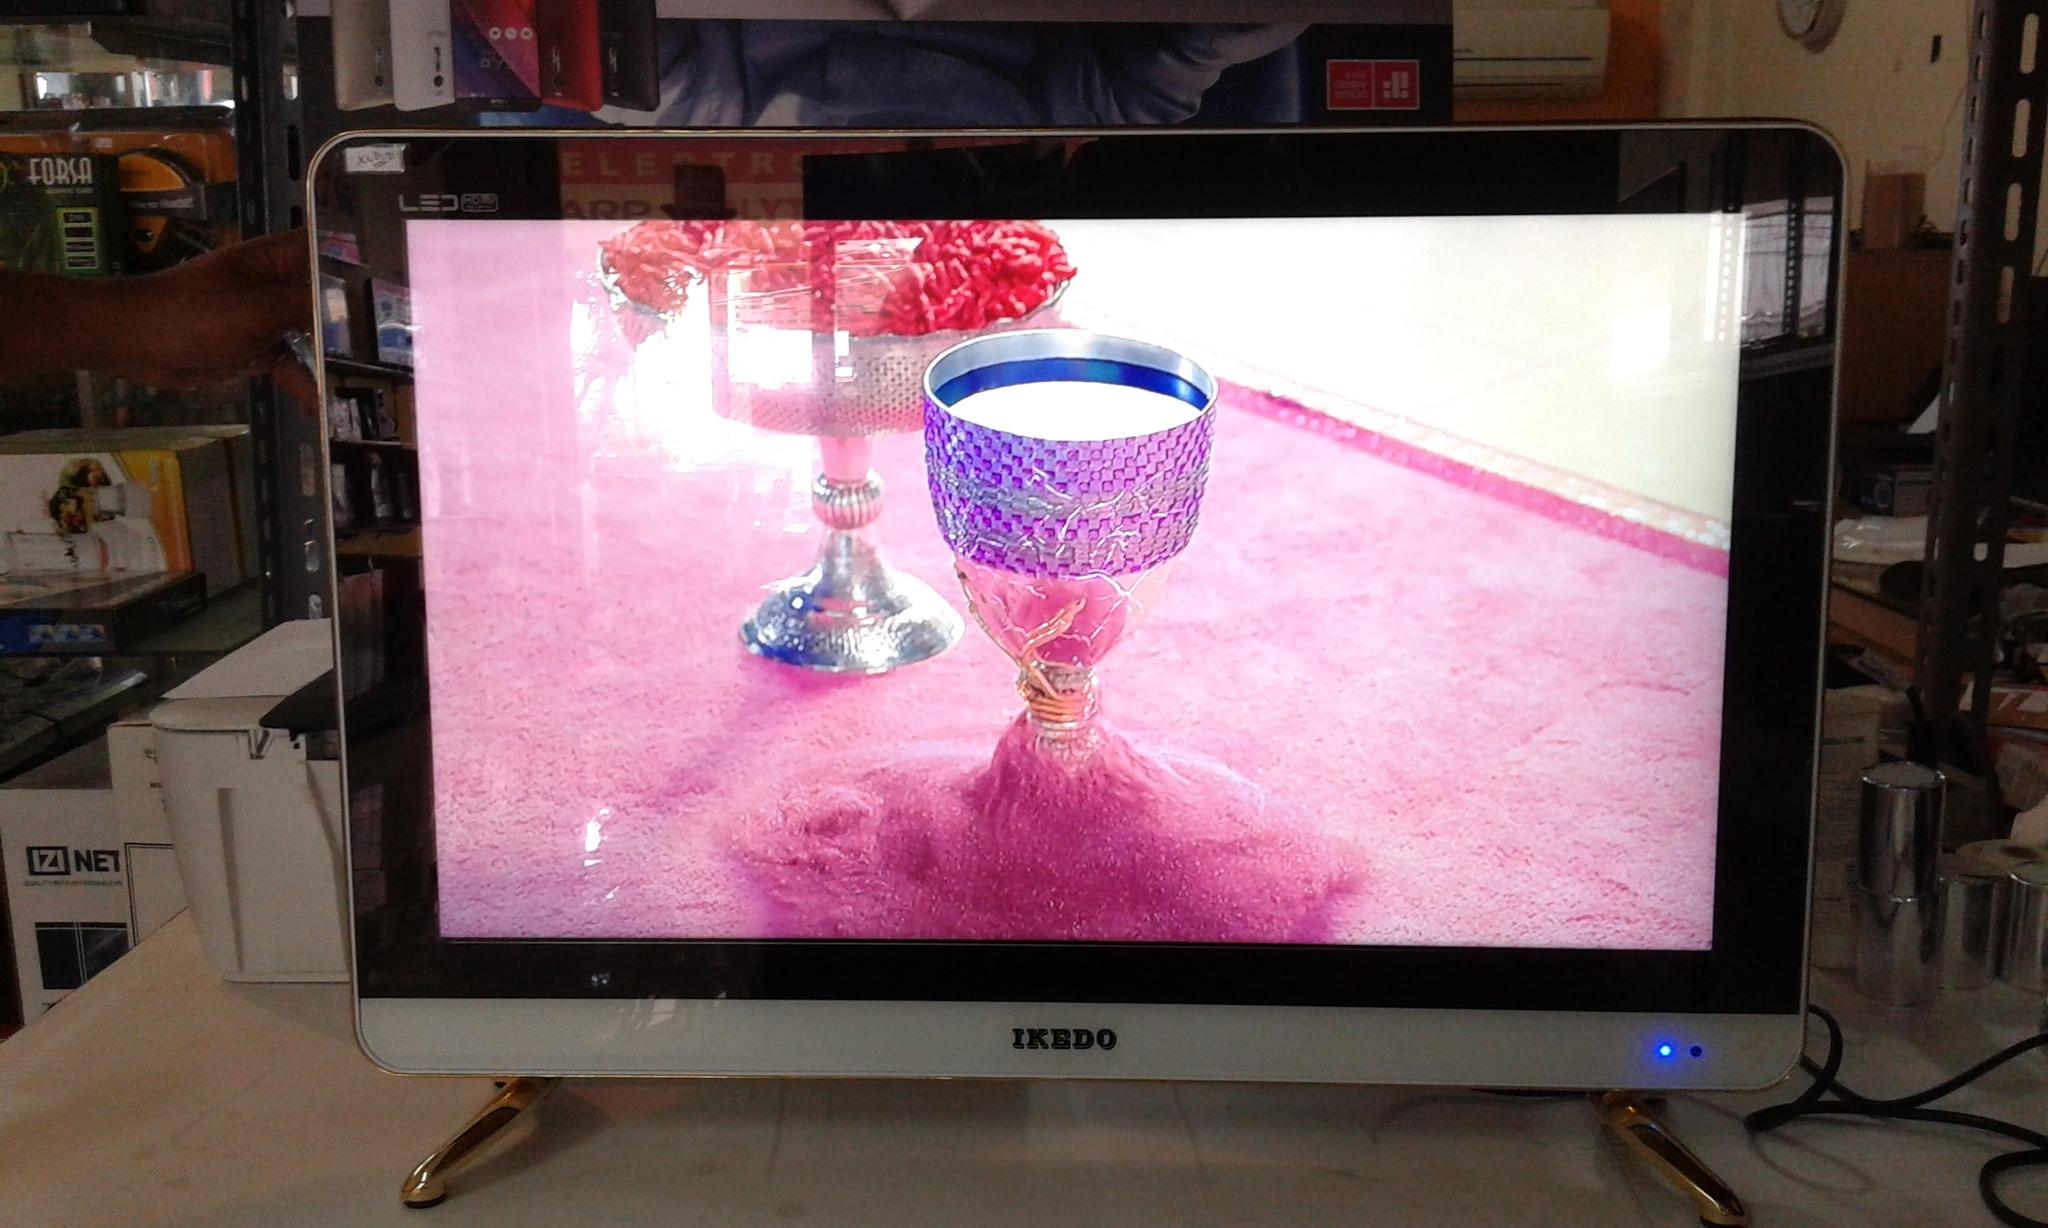 Ikedo Led Tv 17 Inch Hitam Daftar Harga Terlengkap Indonesia Terkini 32 M1a Dolby Surround Sytema Gratis Powerstrip Huntkey Sga301 22 Putih Ezyhero Source 24